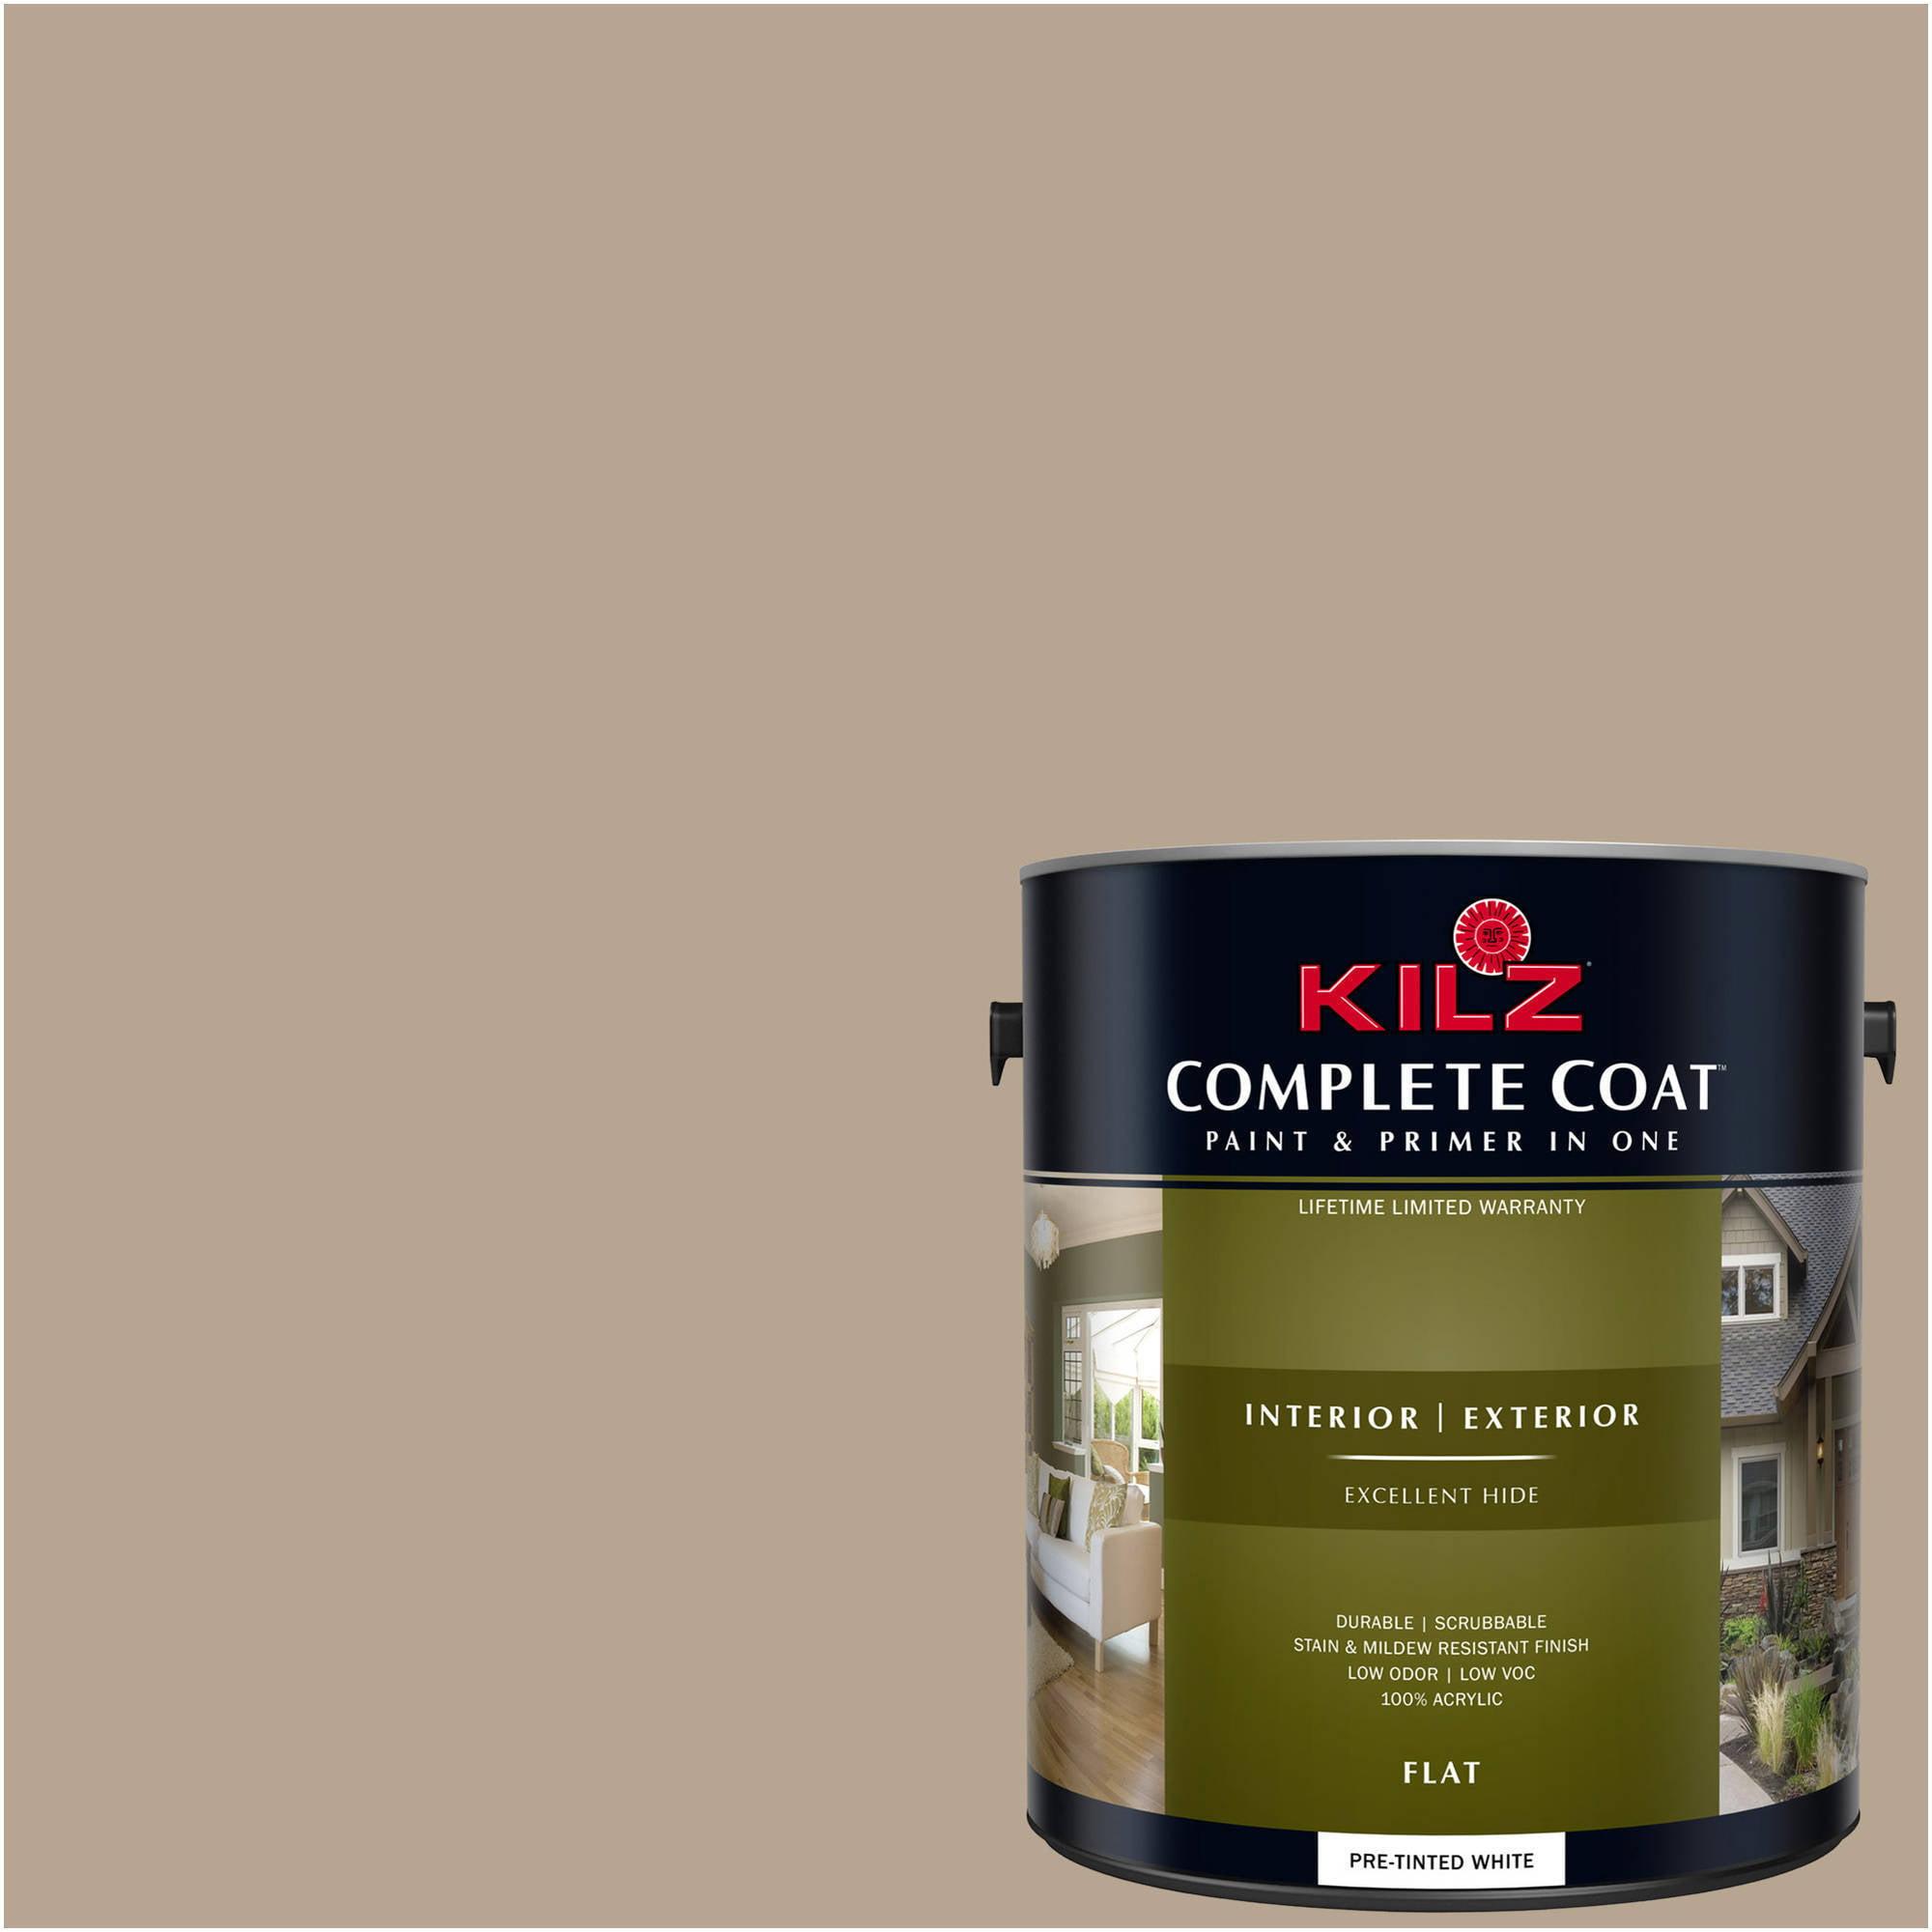 KILZ COMPLETE COAT Interior/Exterior Paint & Primer in One #LL200 Iced Mocha